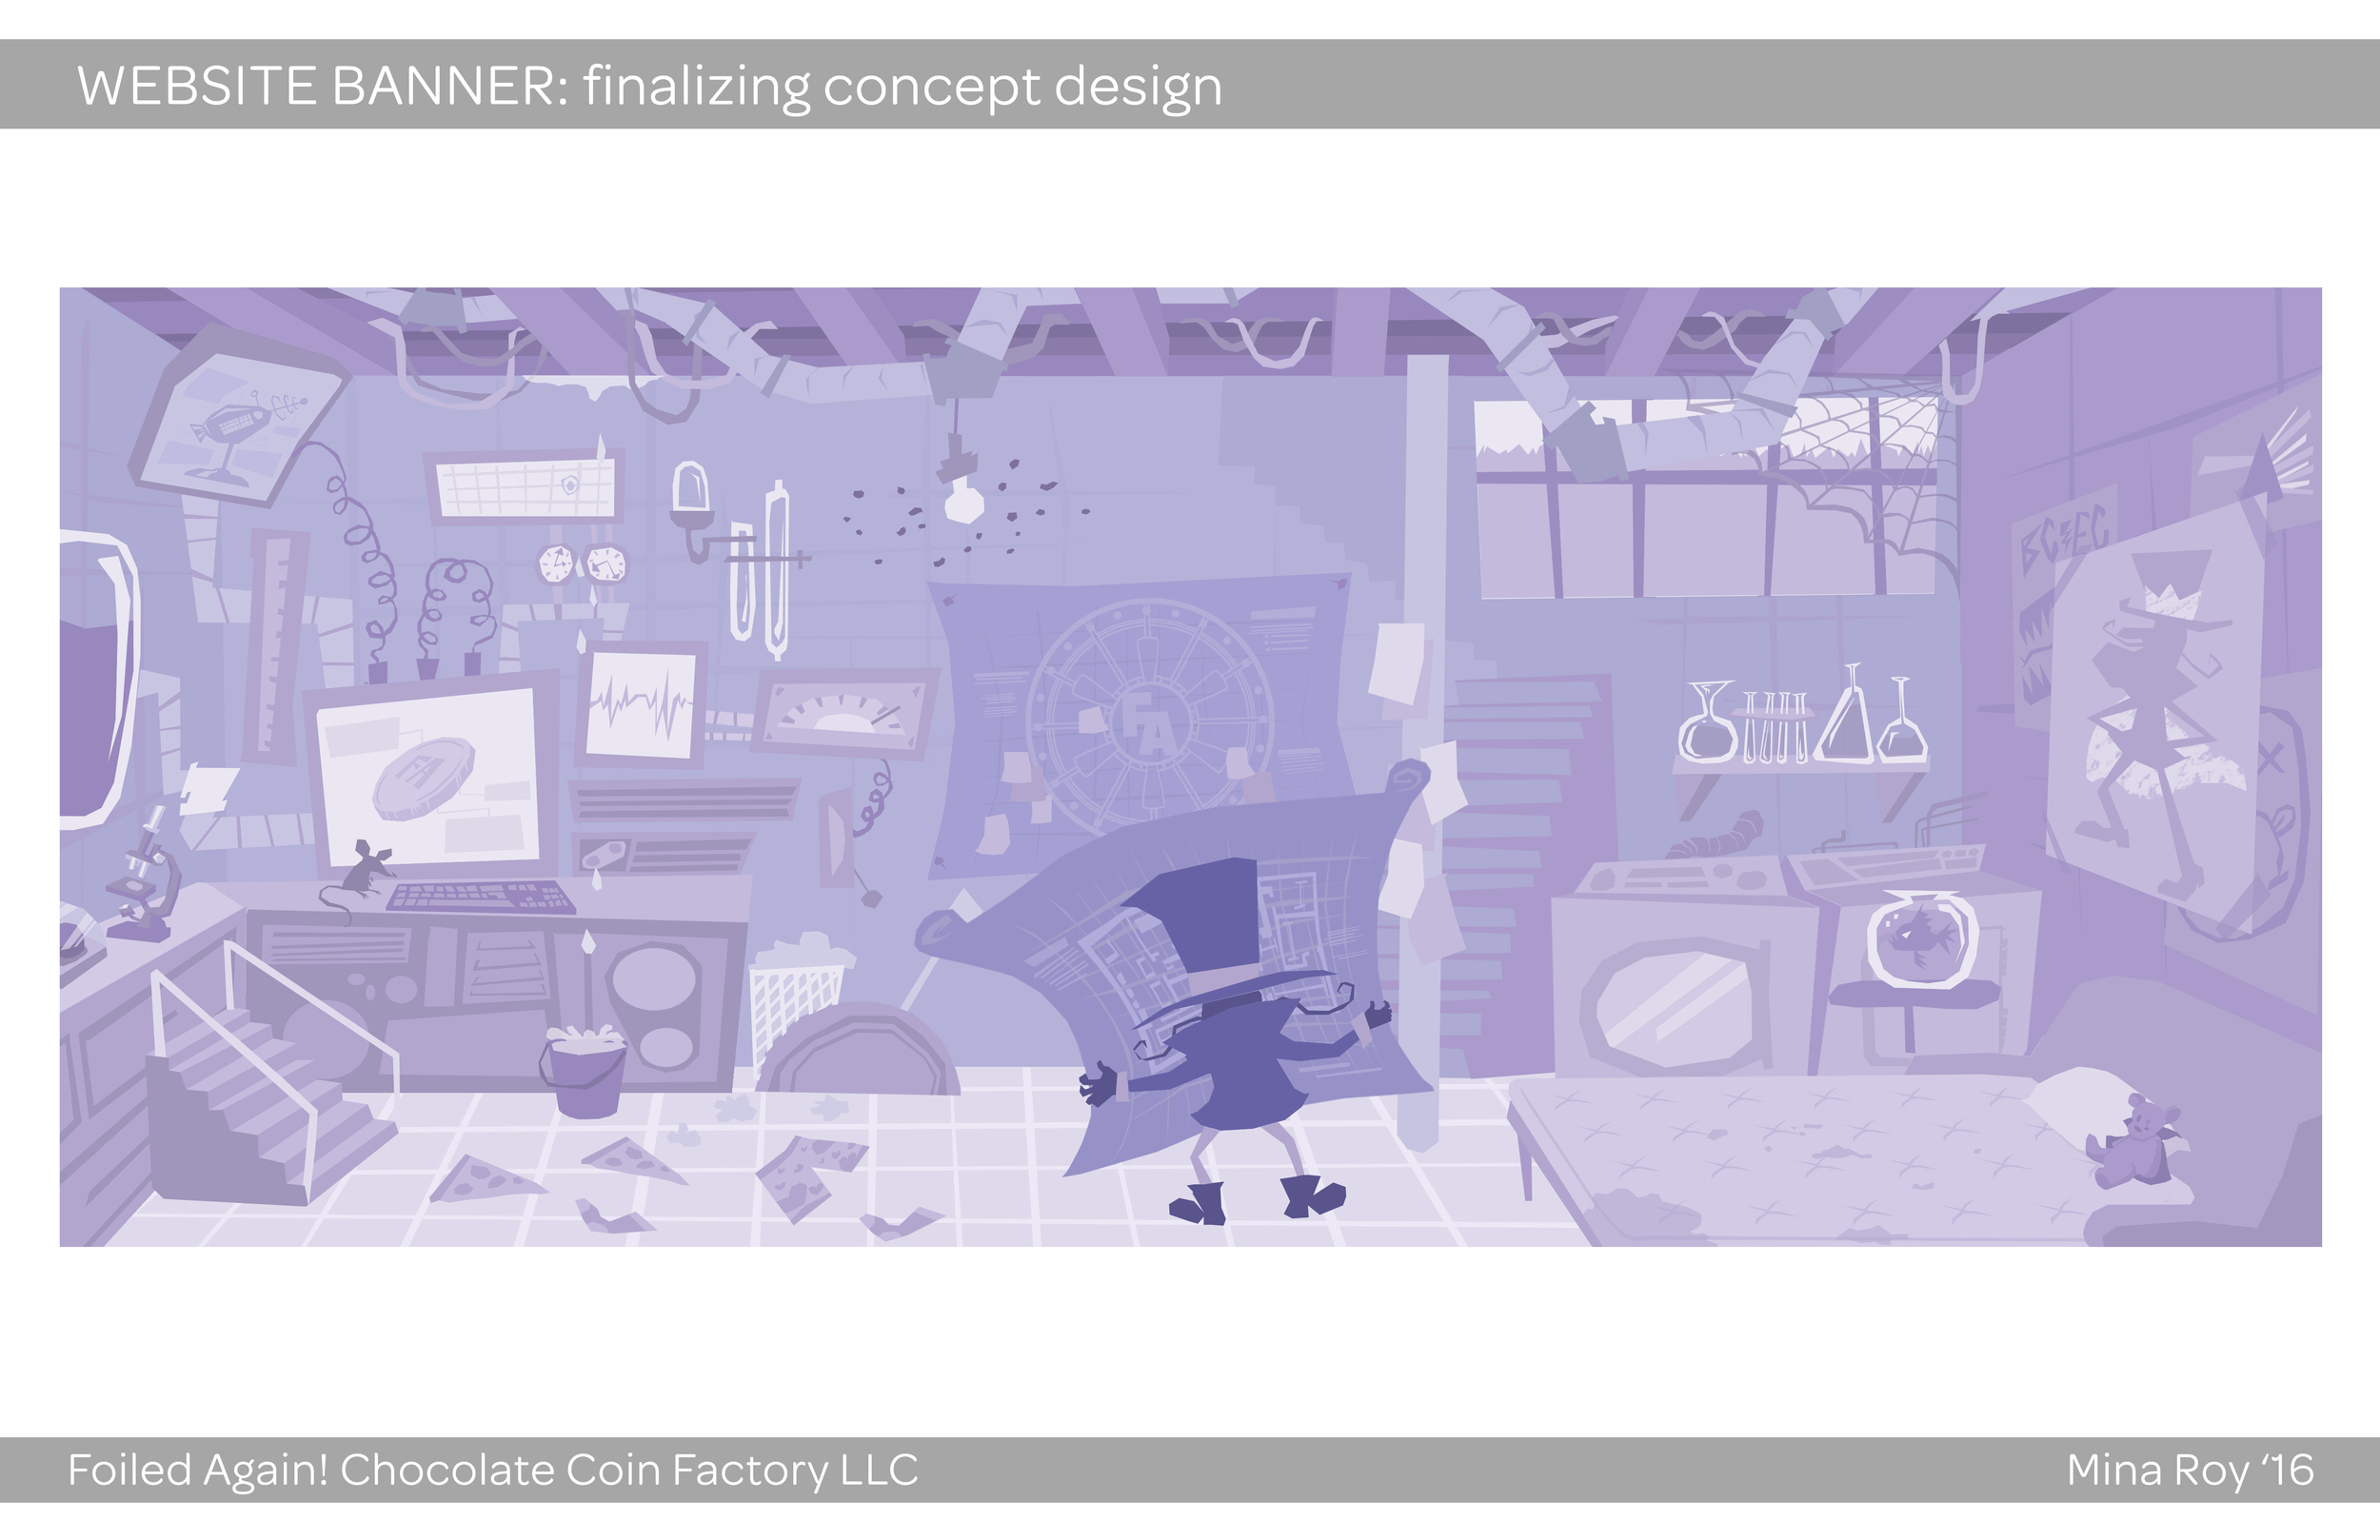 MinaRoy_FA_website banner-conceptdesign-finalizing-presentation2.jpg